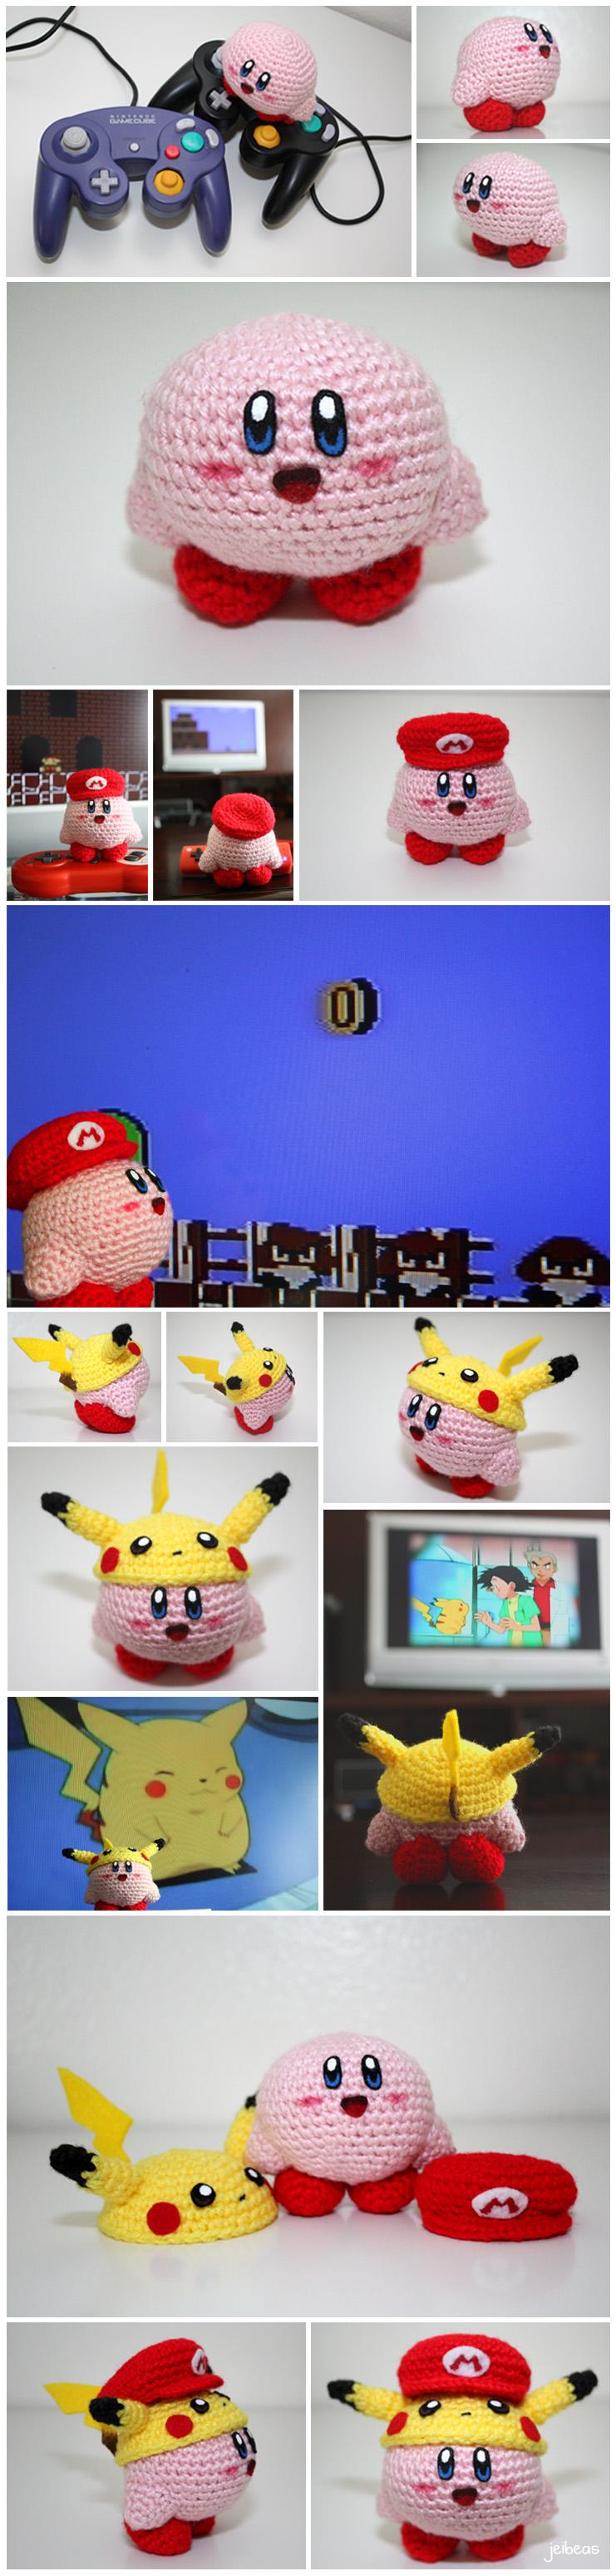 Kirby + Mario and Pikachu hats by jeibeas